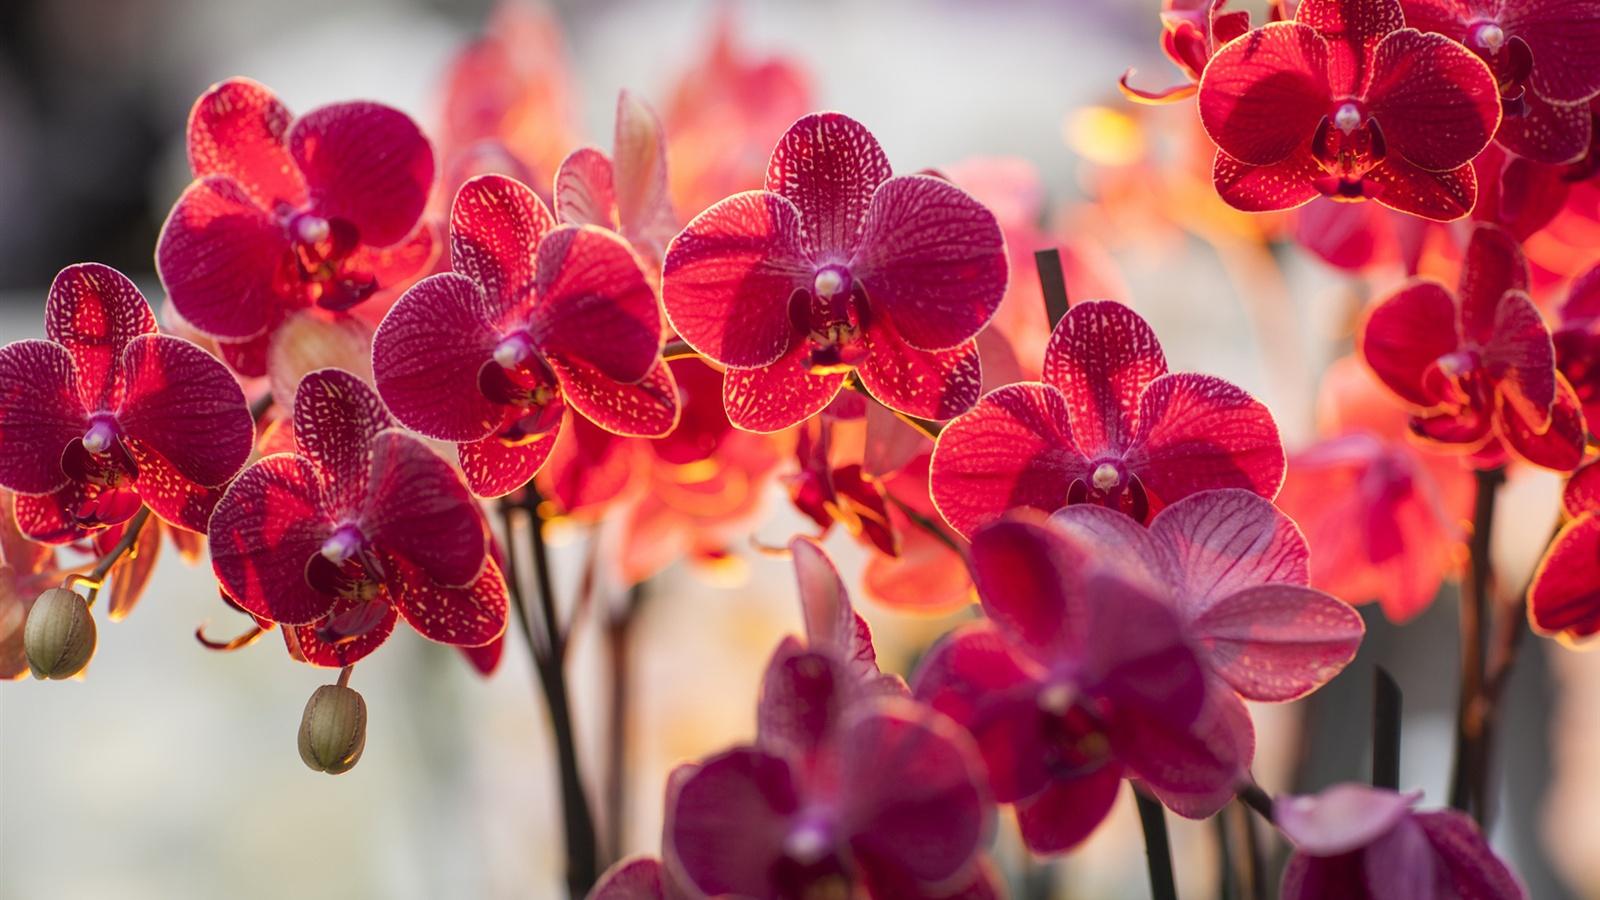 Flowers Wallpapers 5 Phalaenopsis Red Spring Wallpaper